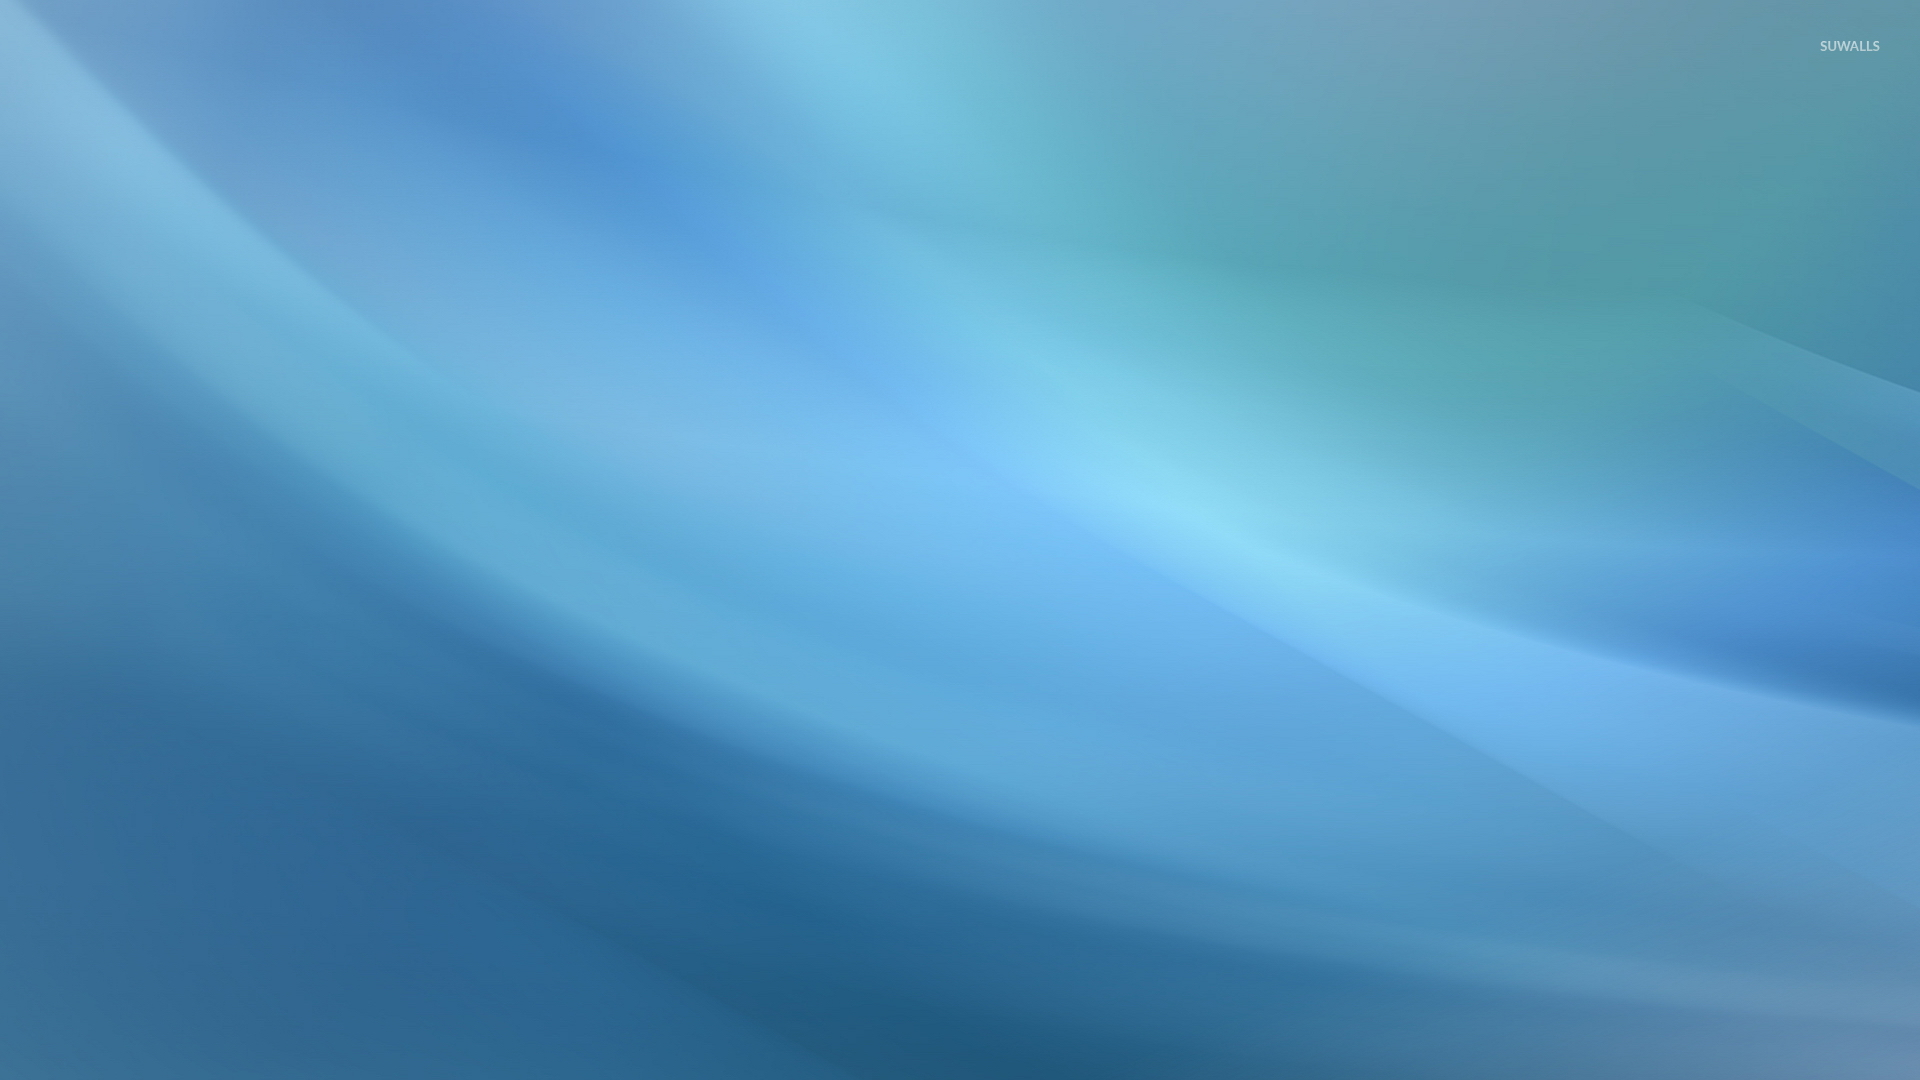 Blue Curves 4 Wallpaper Abstract Curve Blur 1920x1080